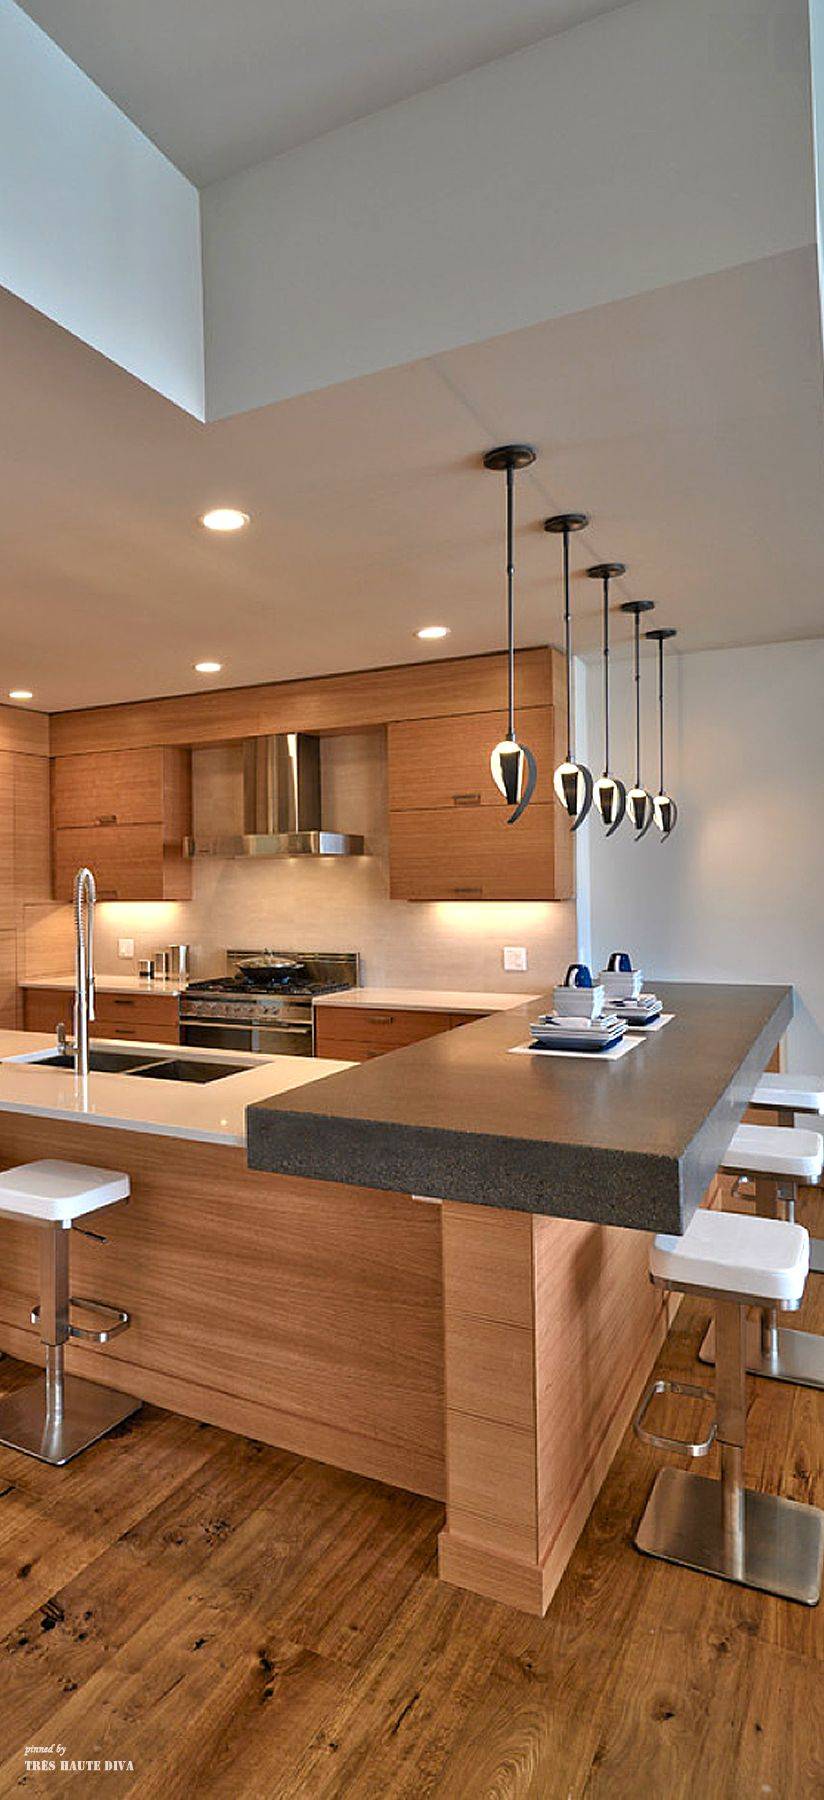 30 Elegant Contemporary Kitchen Ideas Luks Mutfaklar Ic Tasarim